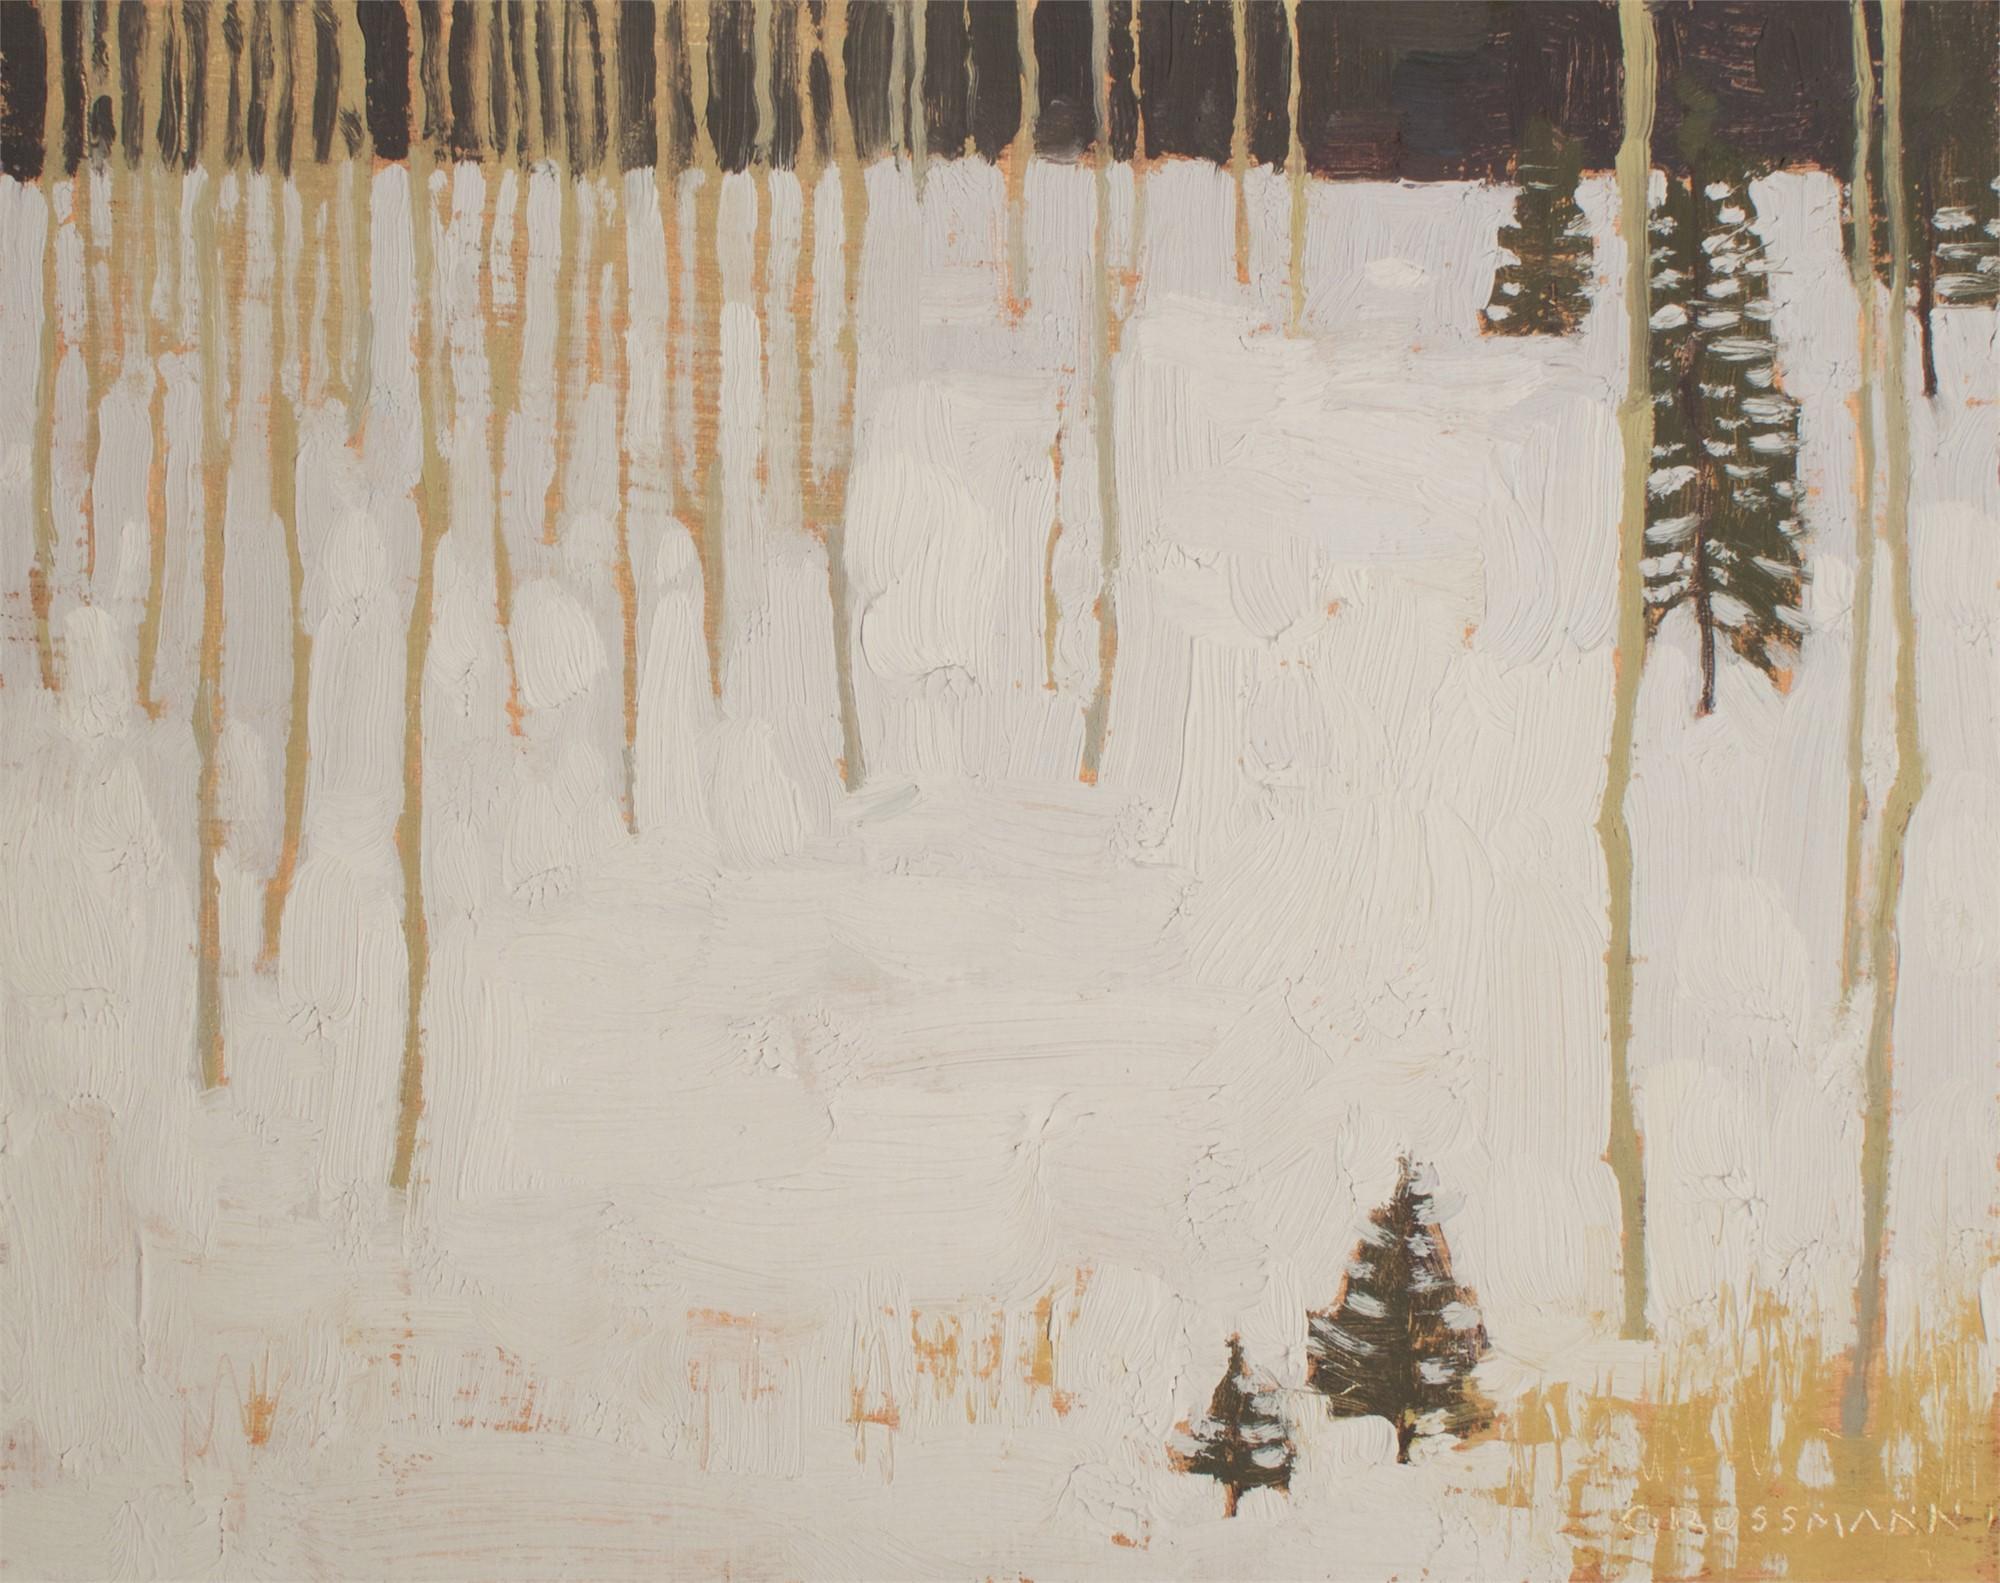 Christmas Tree Season by David Grossmann